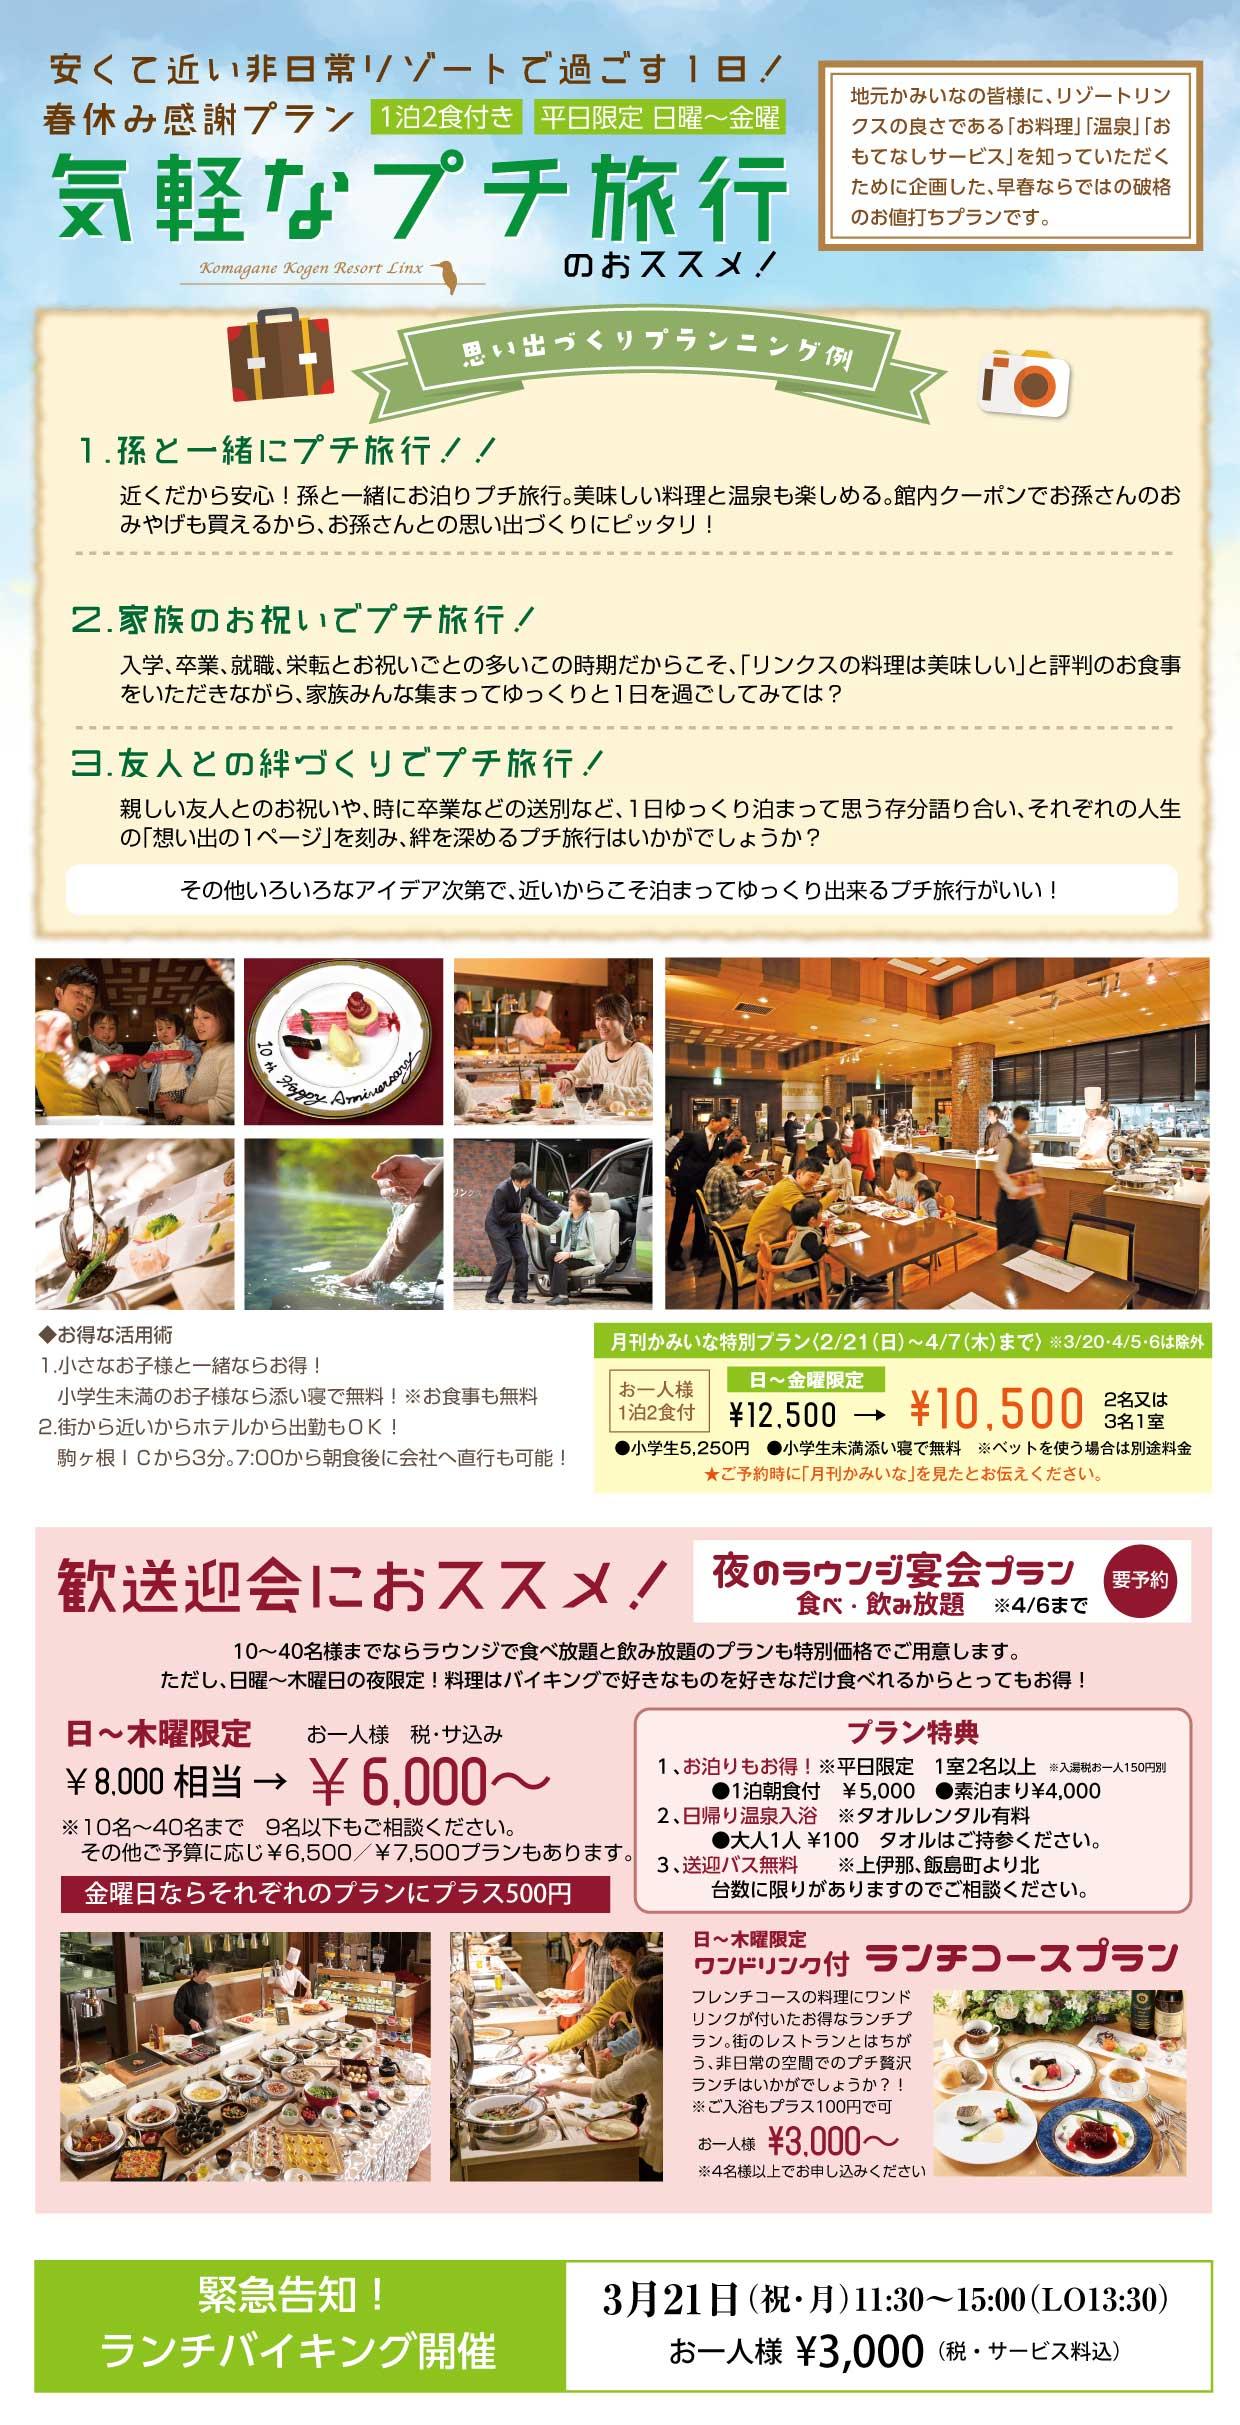 http://www.komagane-linx.co.jp/blogimages/kamiina201603.jpg